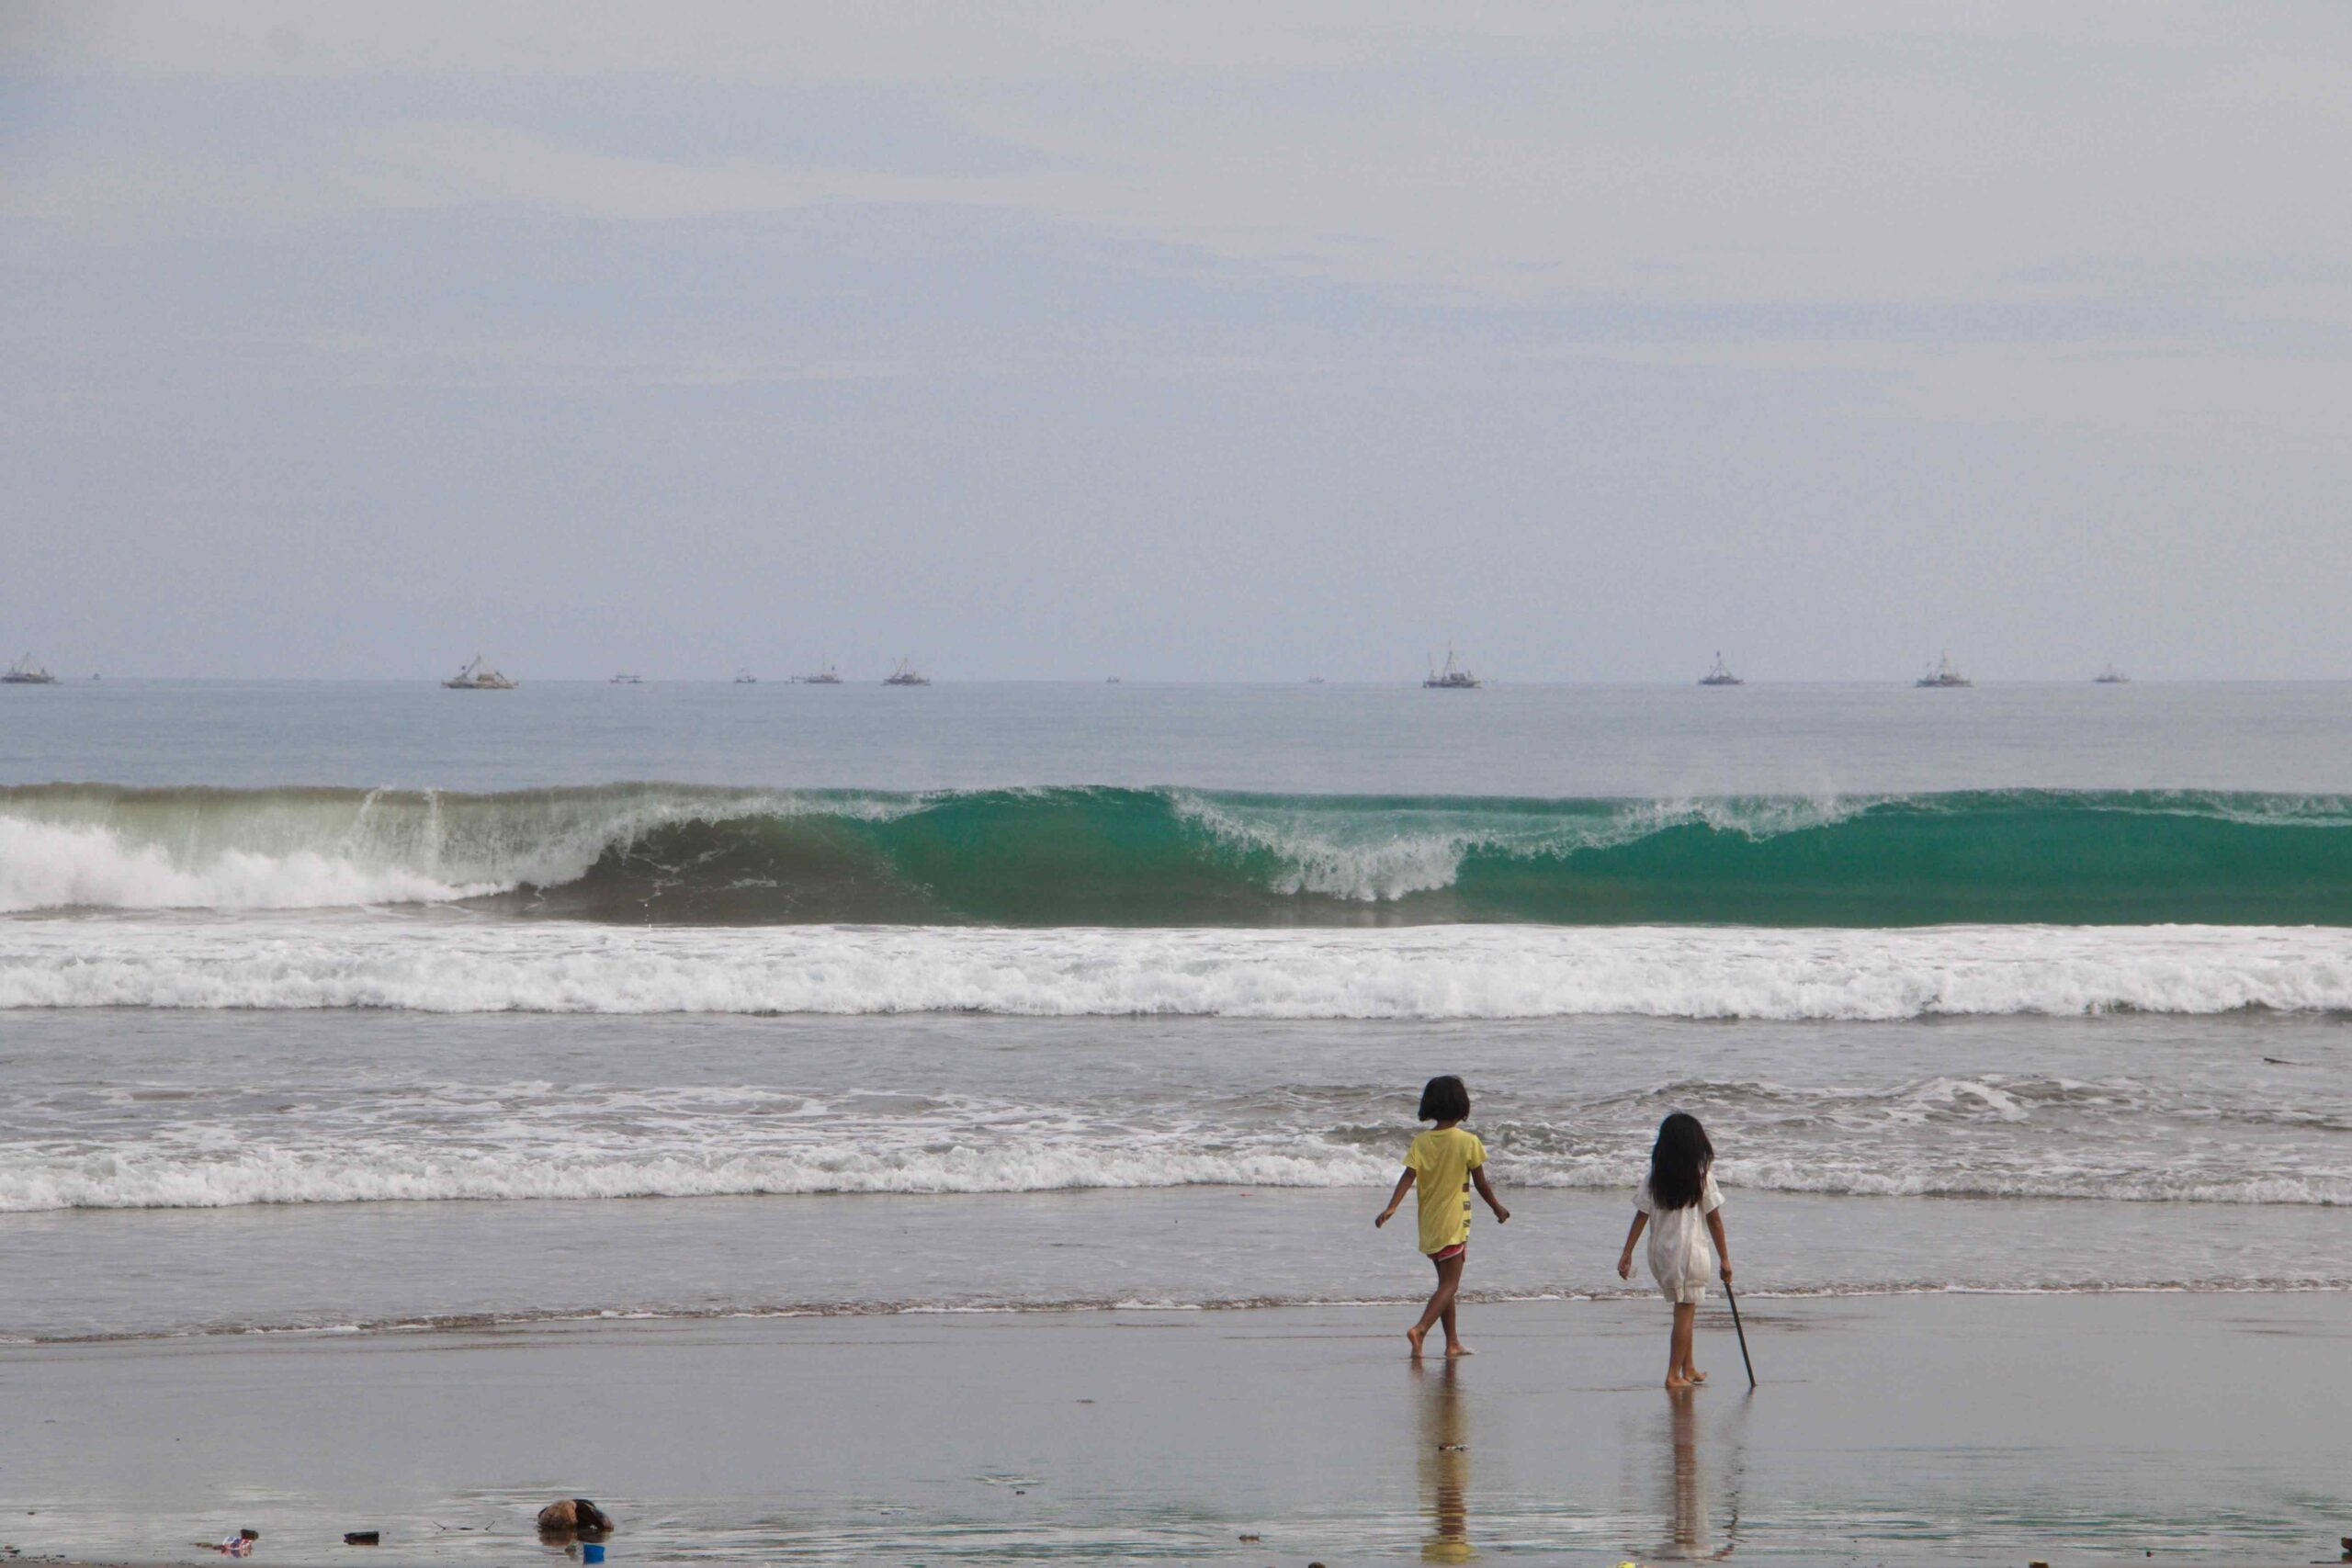 Kids on the beach in cimaja java